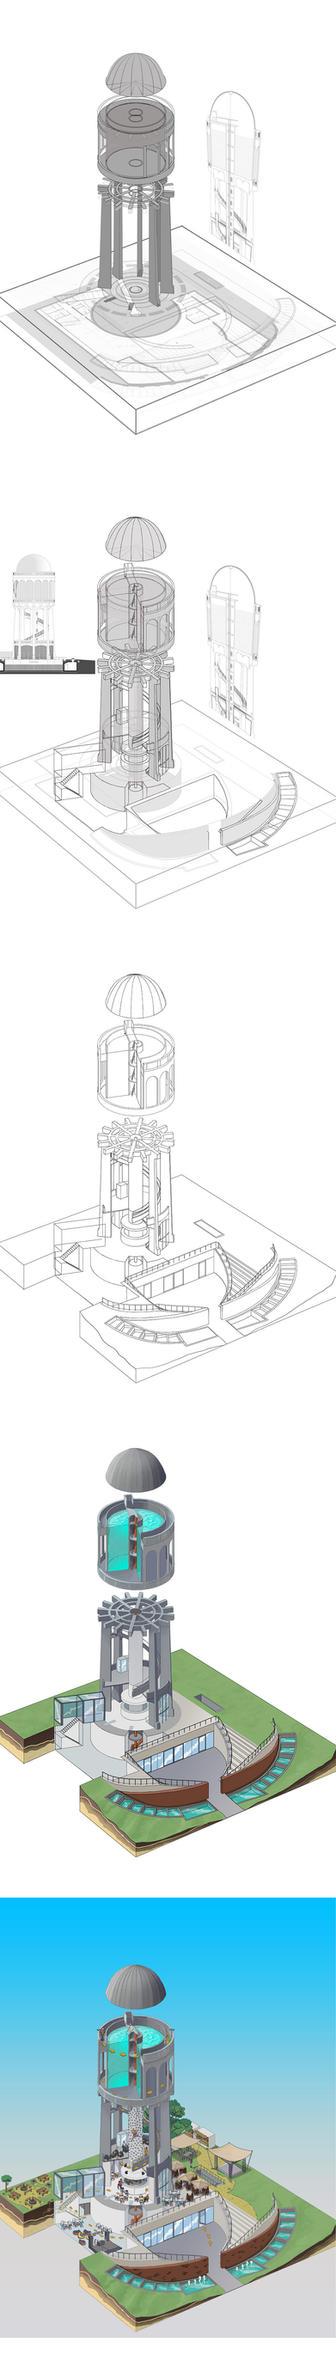 Water Tower Debrecen by foreest83